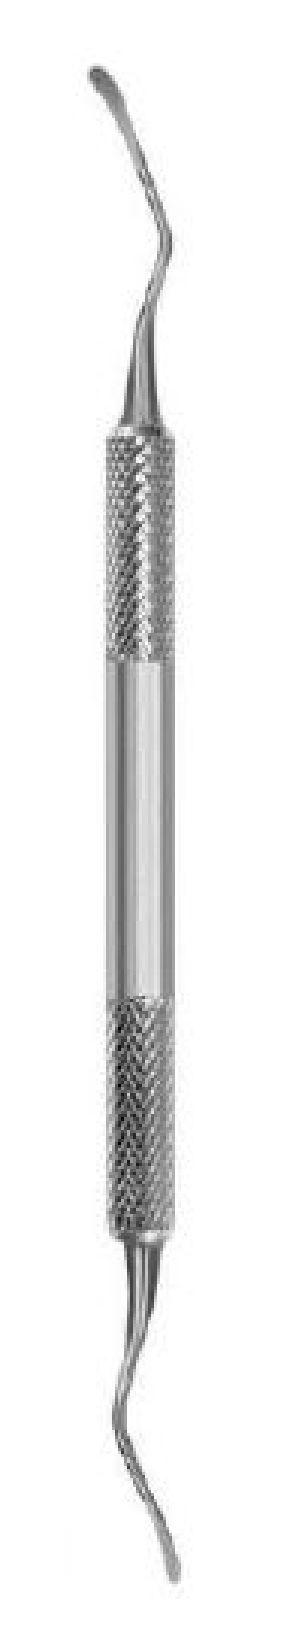 965 Sinus Lift Instrument